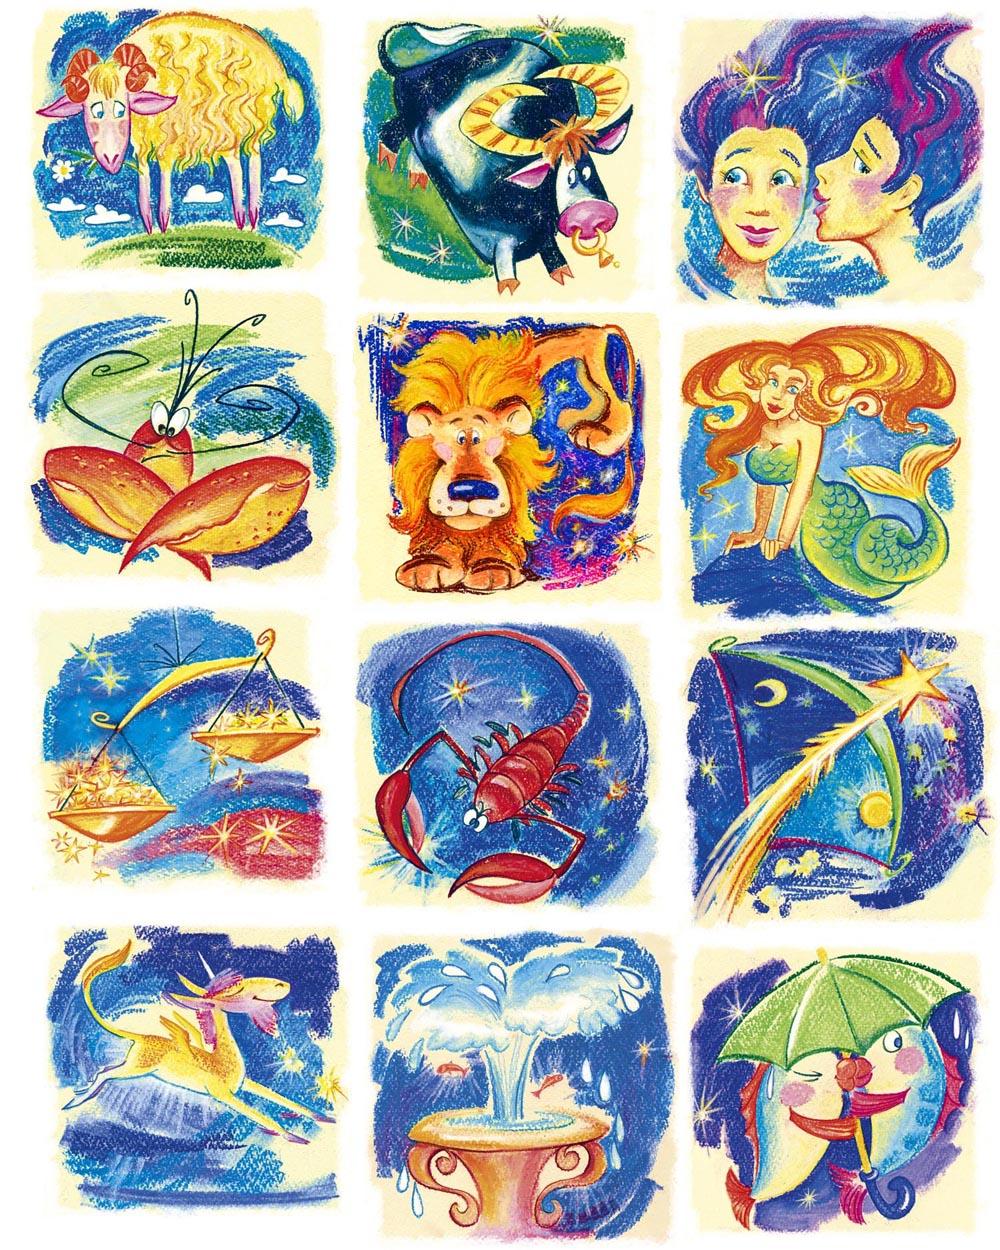 Картинки знаки зодиака по месяцам красивые картинки, днем уголовного